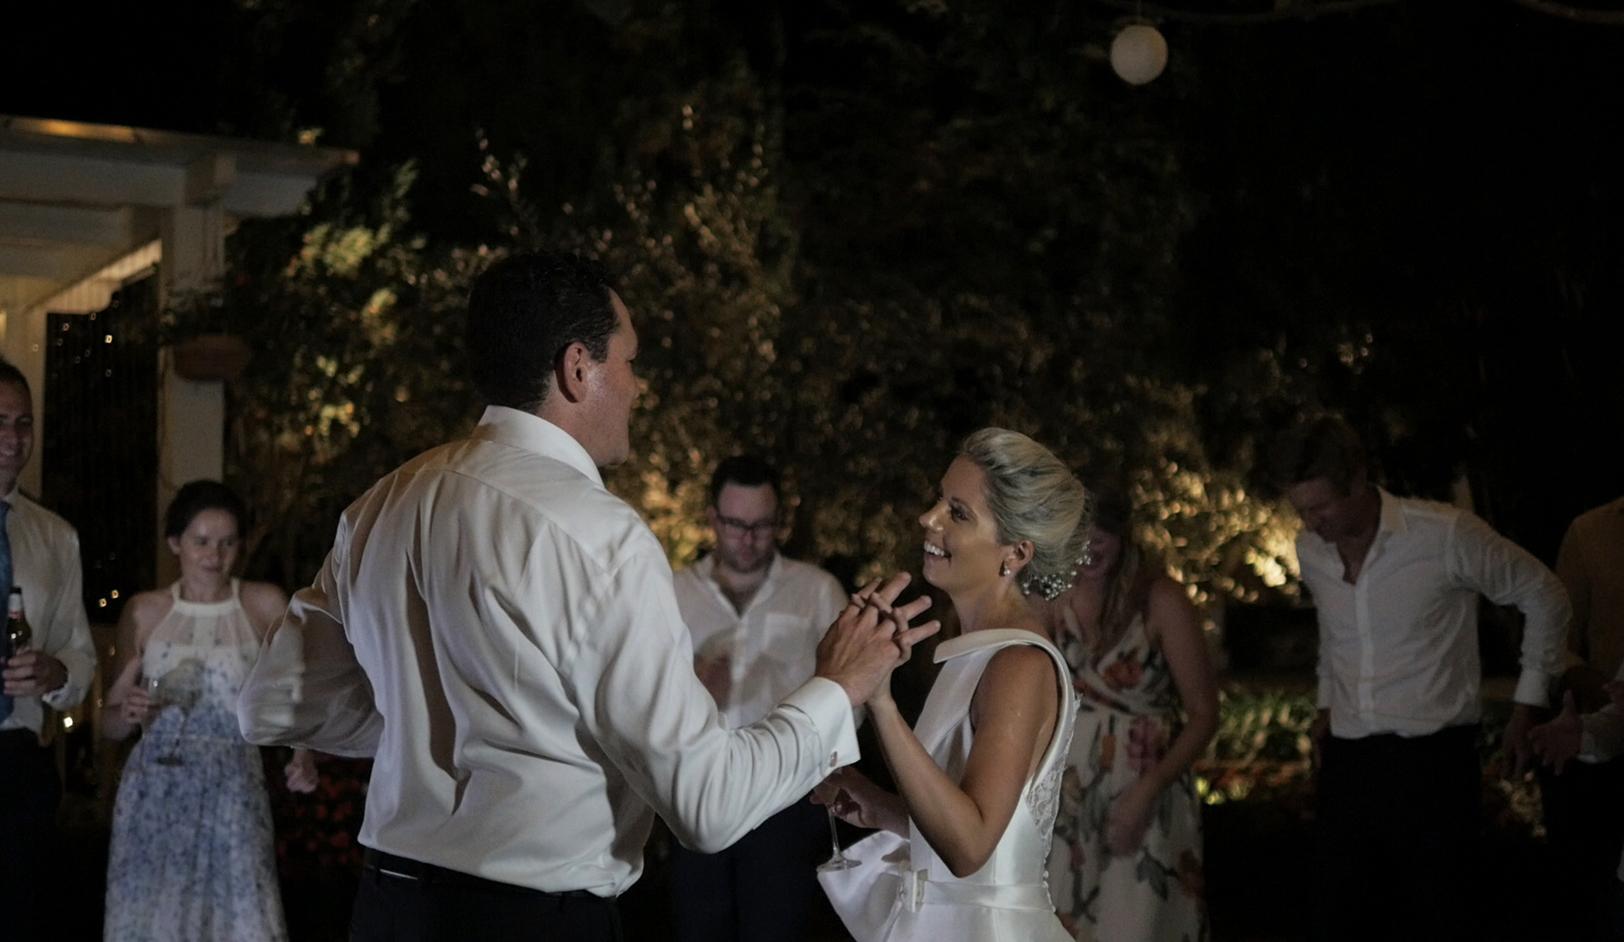 matrimonio-a-villa-eva-sposi-villa-cimbrone-ravello-italia.jpg